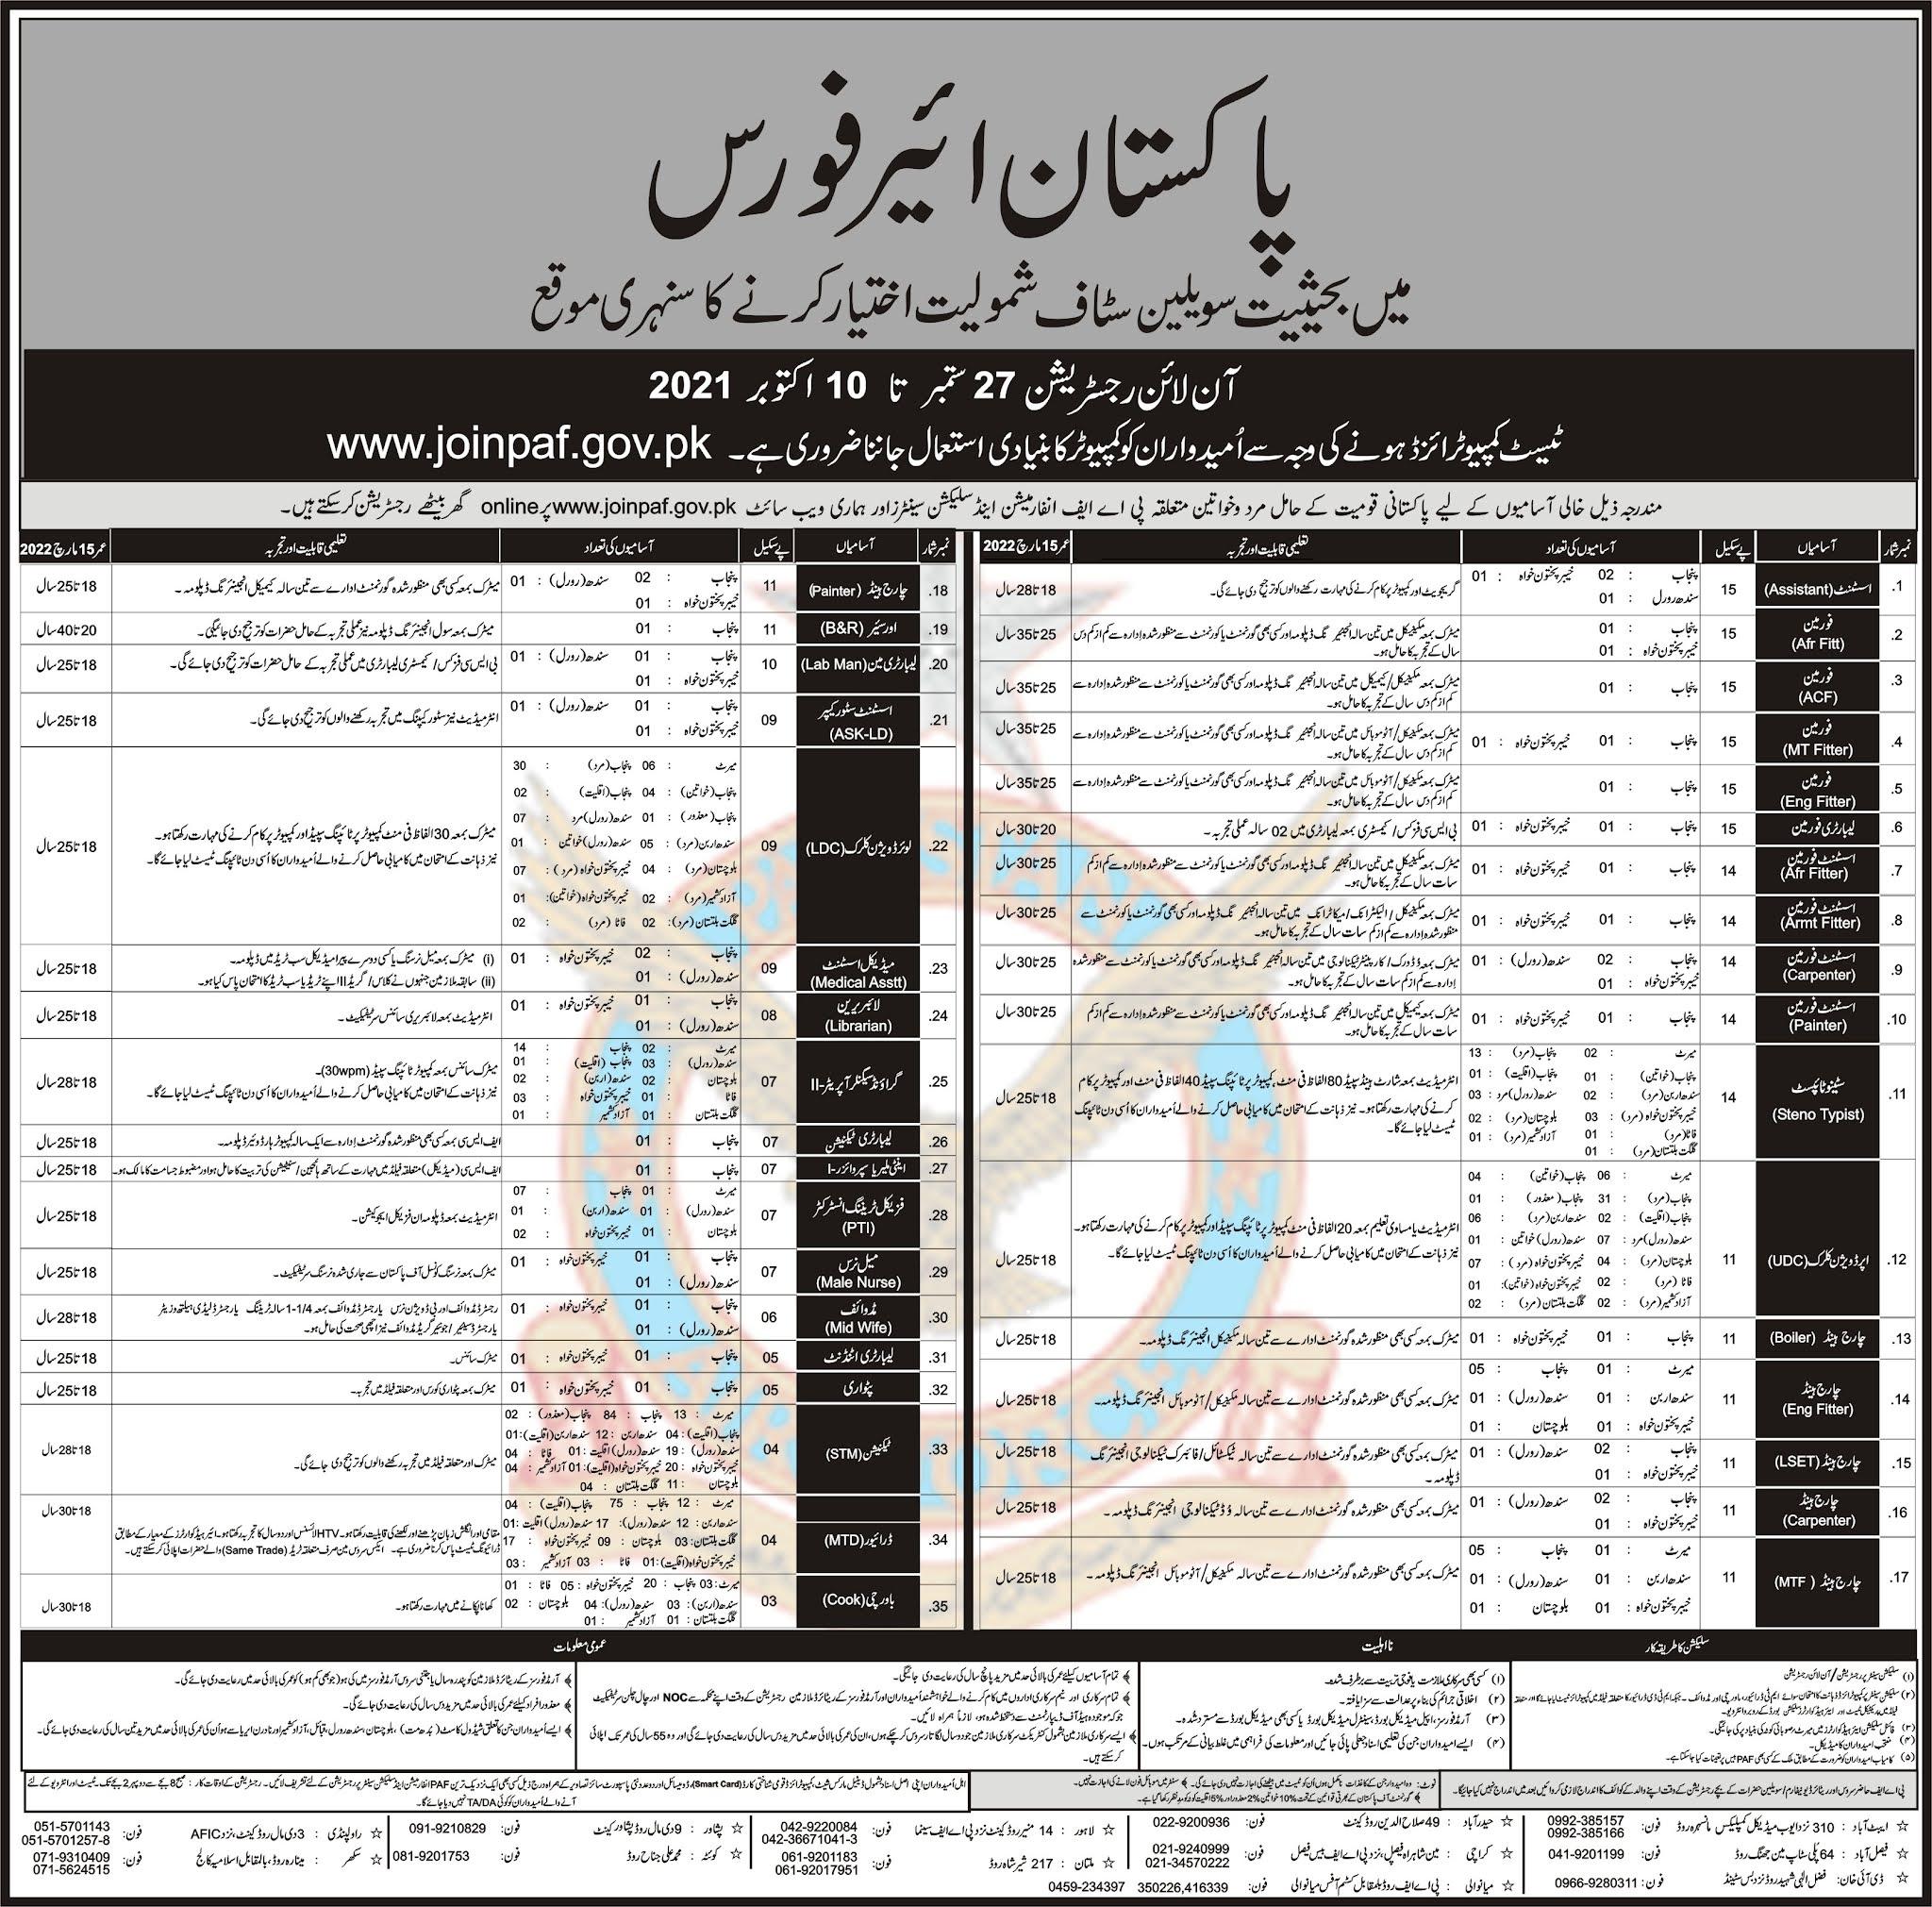 PAKISTAN AIR FORCA (PAF) JOBS-2021-APPLY ONLINE-PAF Jobs 2021 – 800+ Vacancies